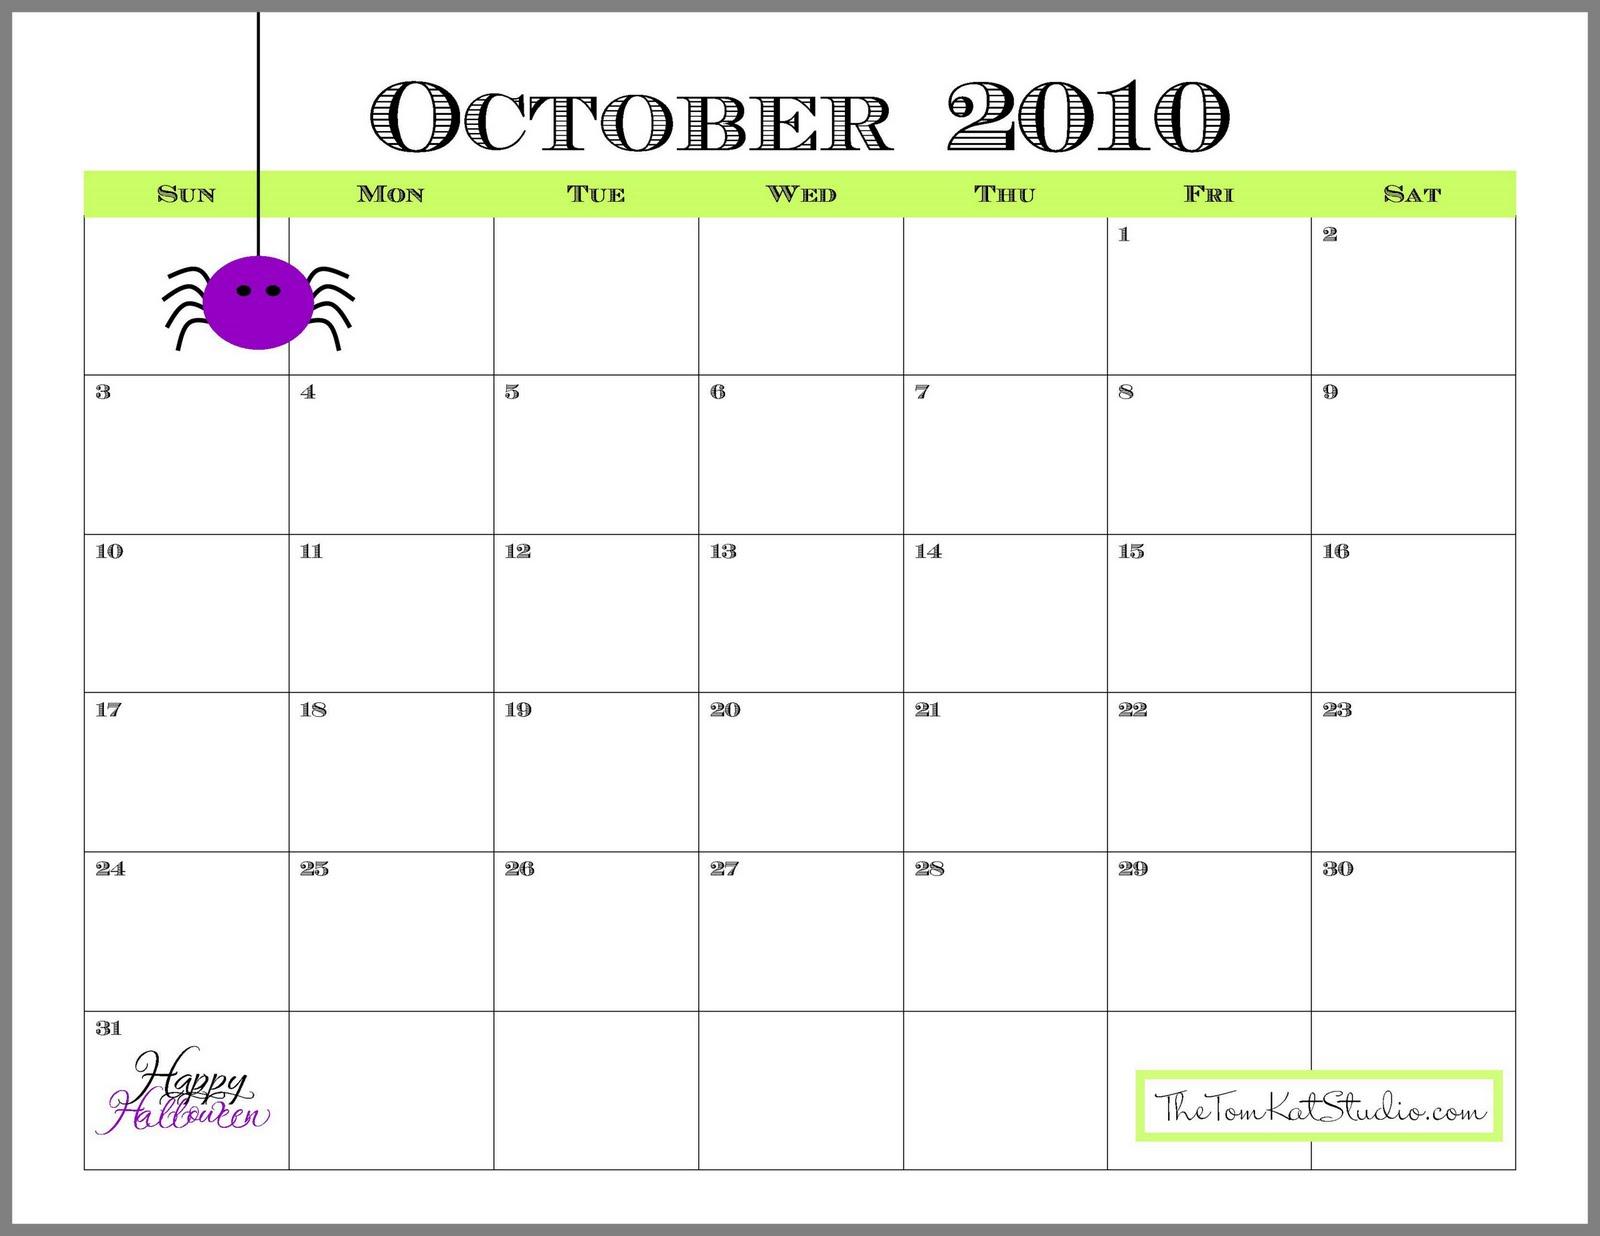 Best Images of Free Printable Calendar All - November 2015 Calendar ...